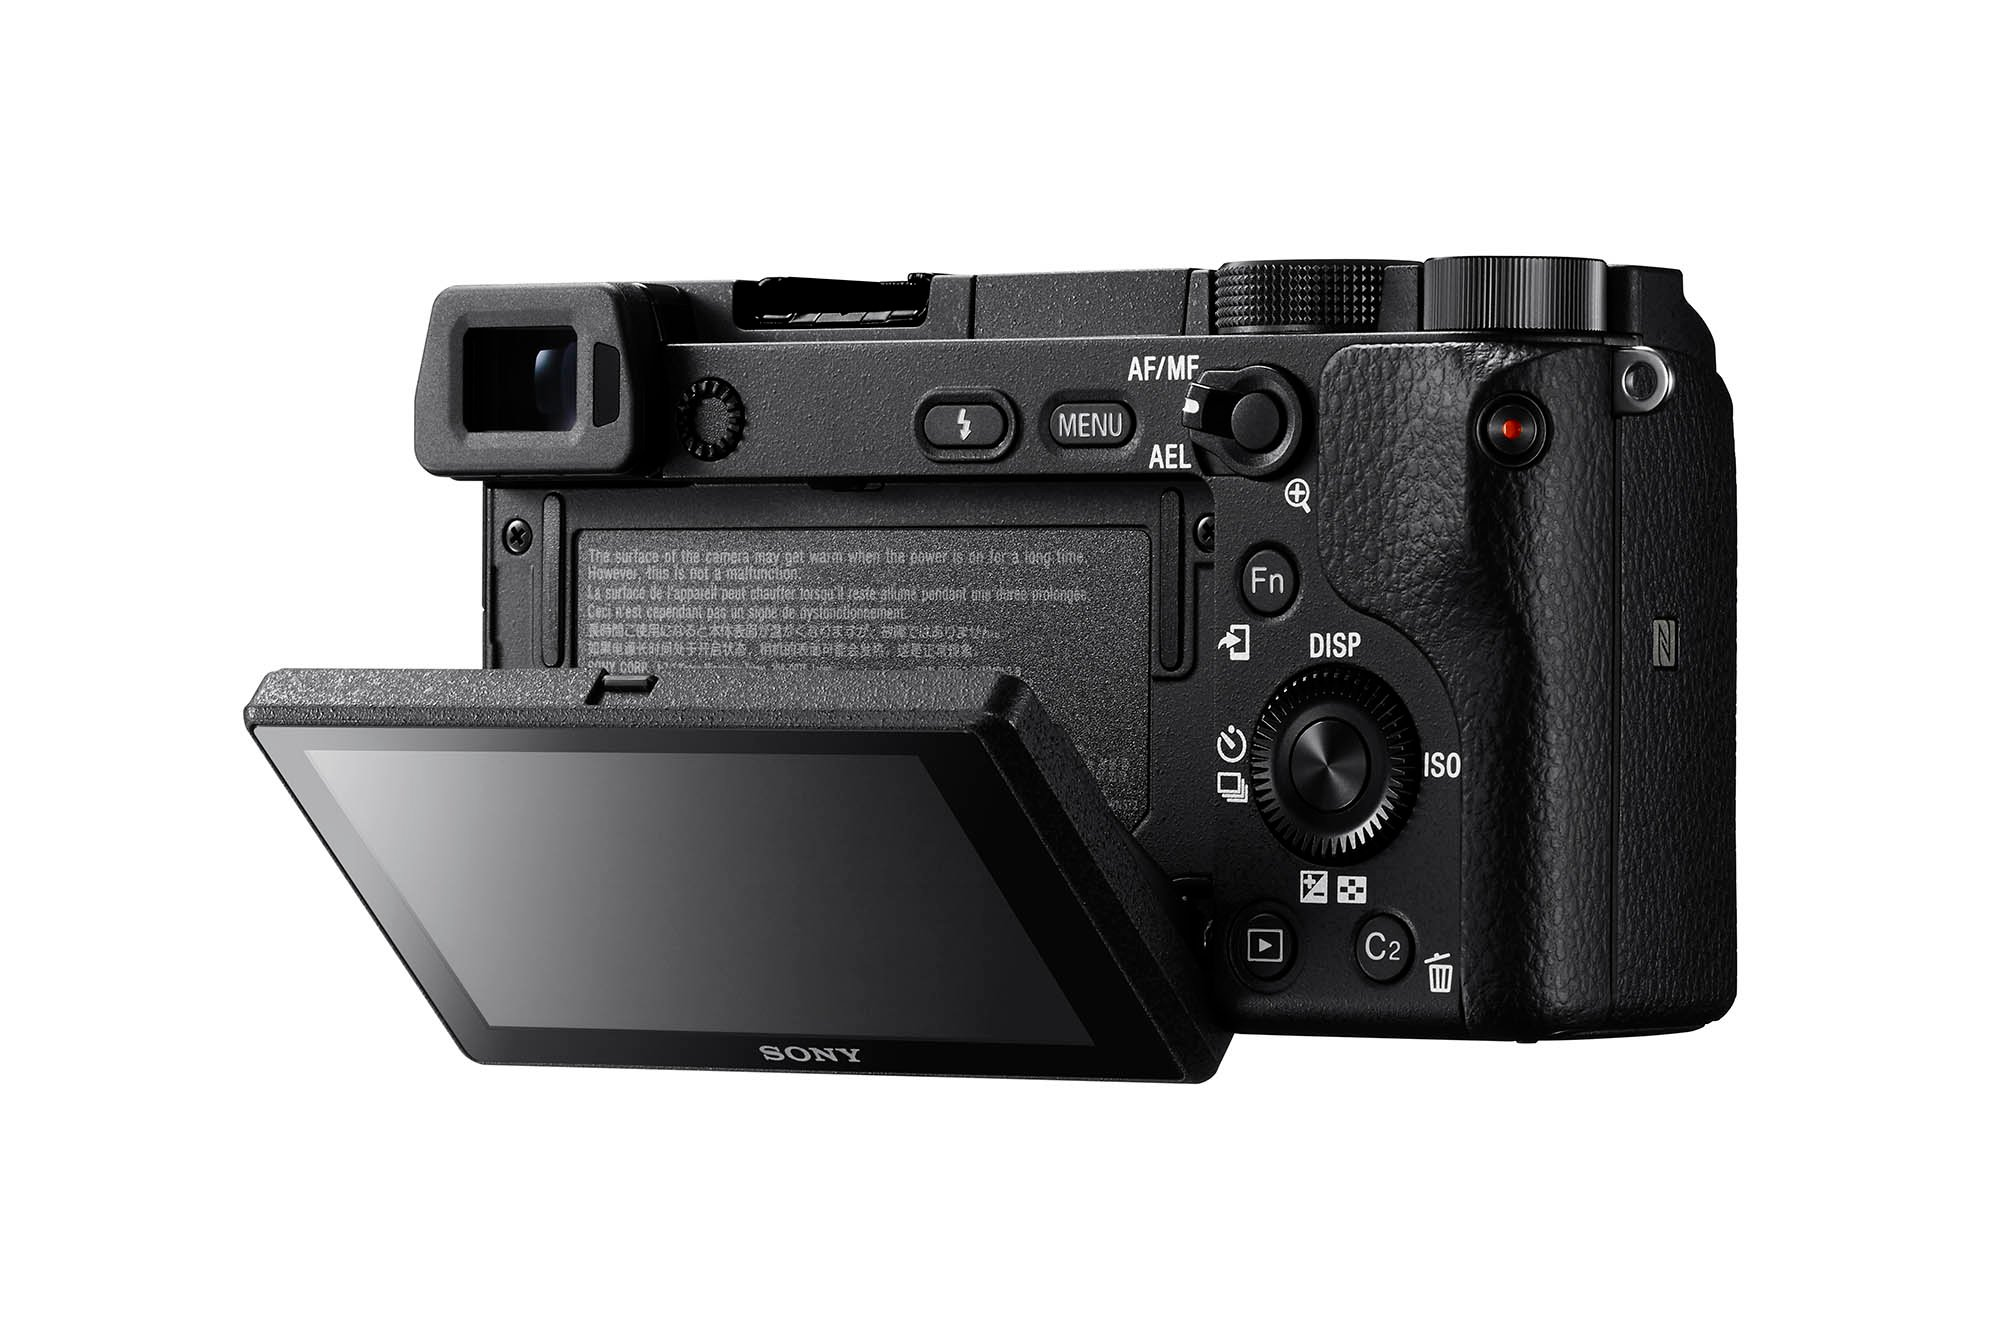 Sony a6300 Rear LCD Tilt